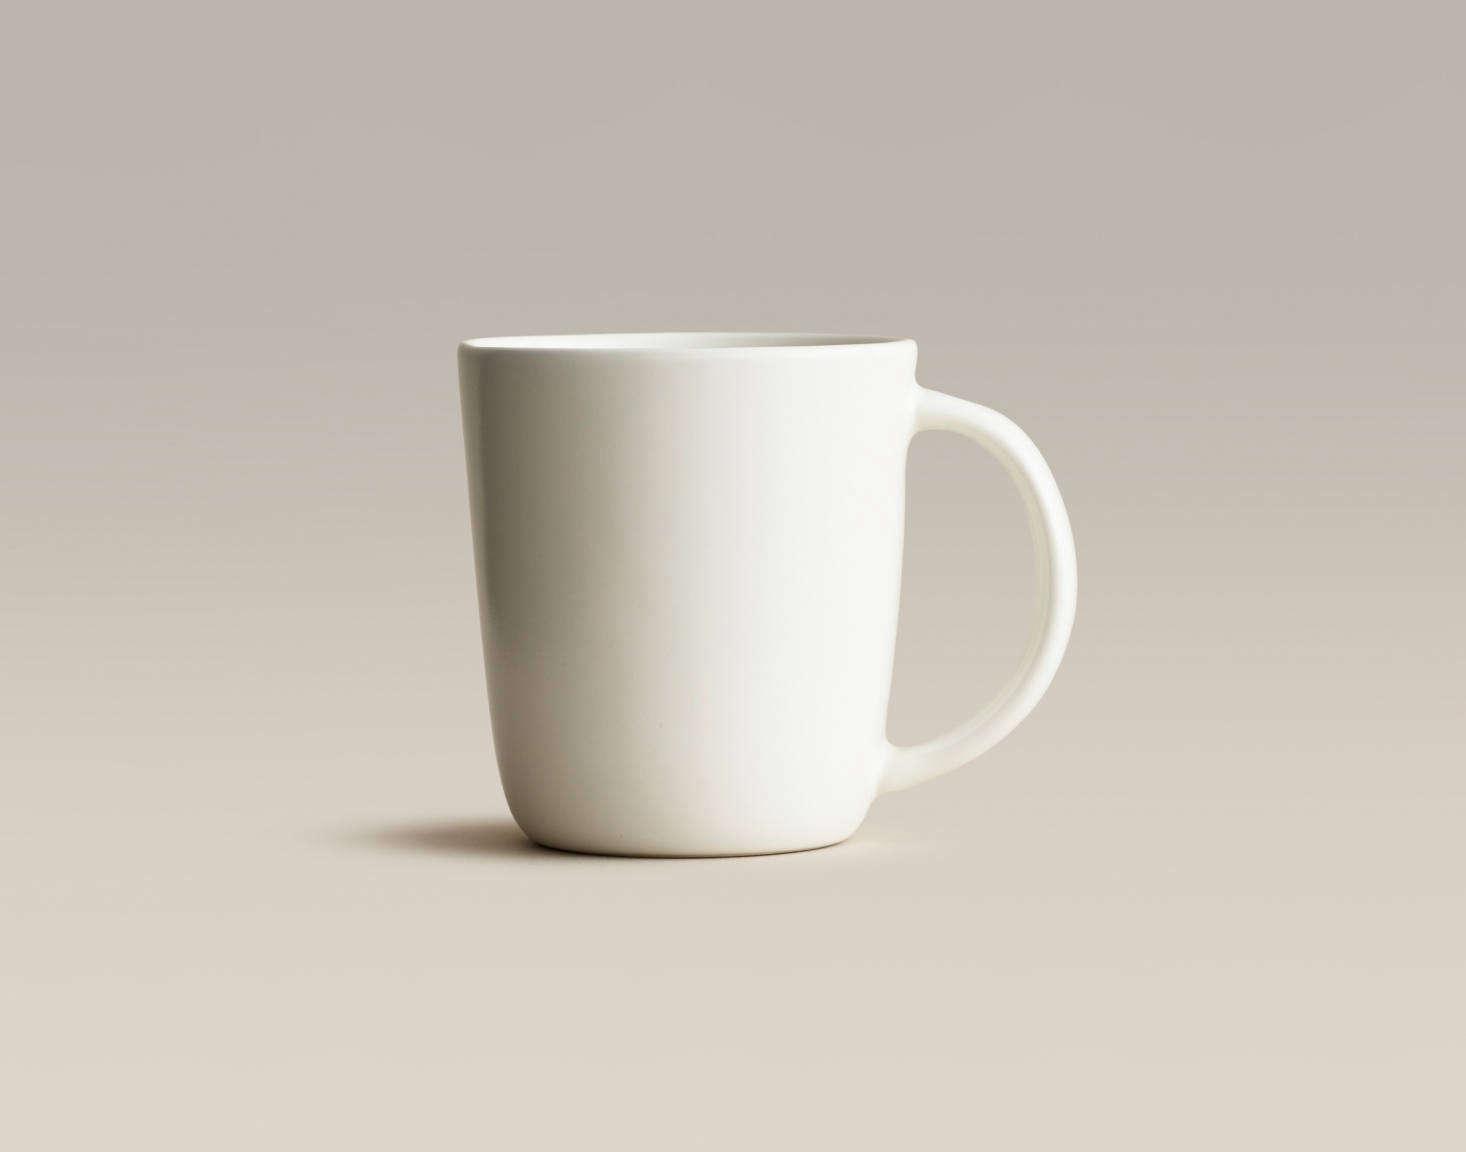 Mugs have a src=